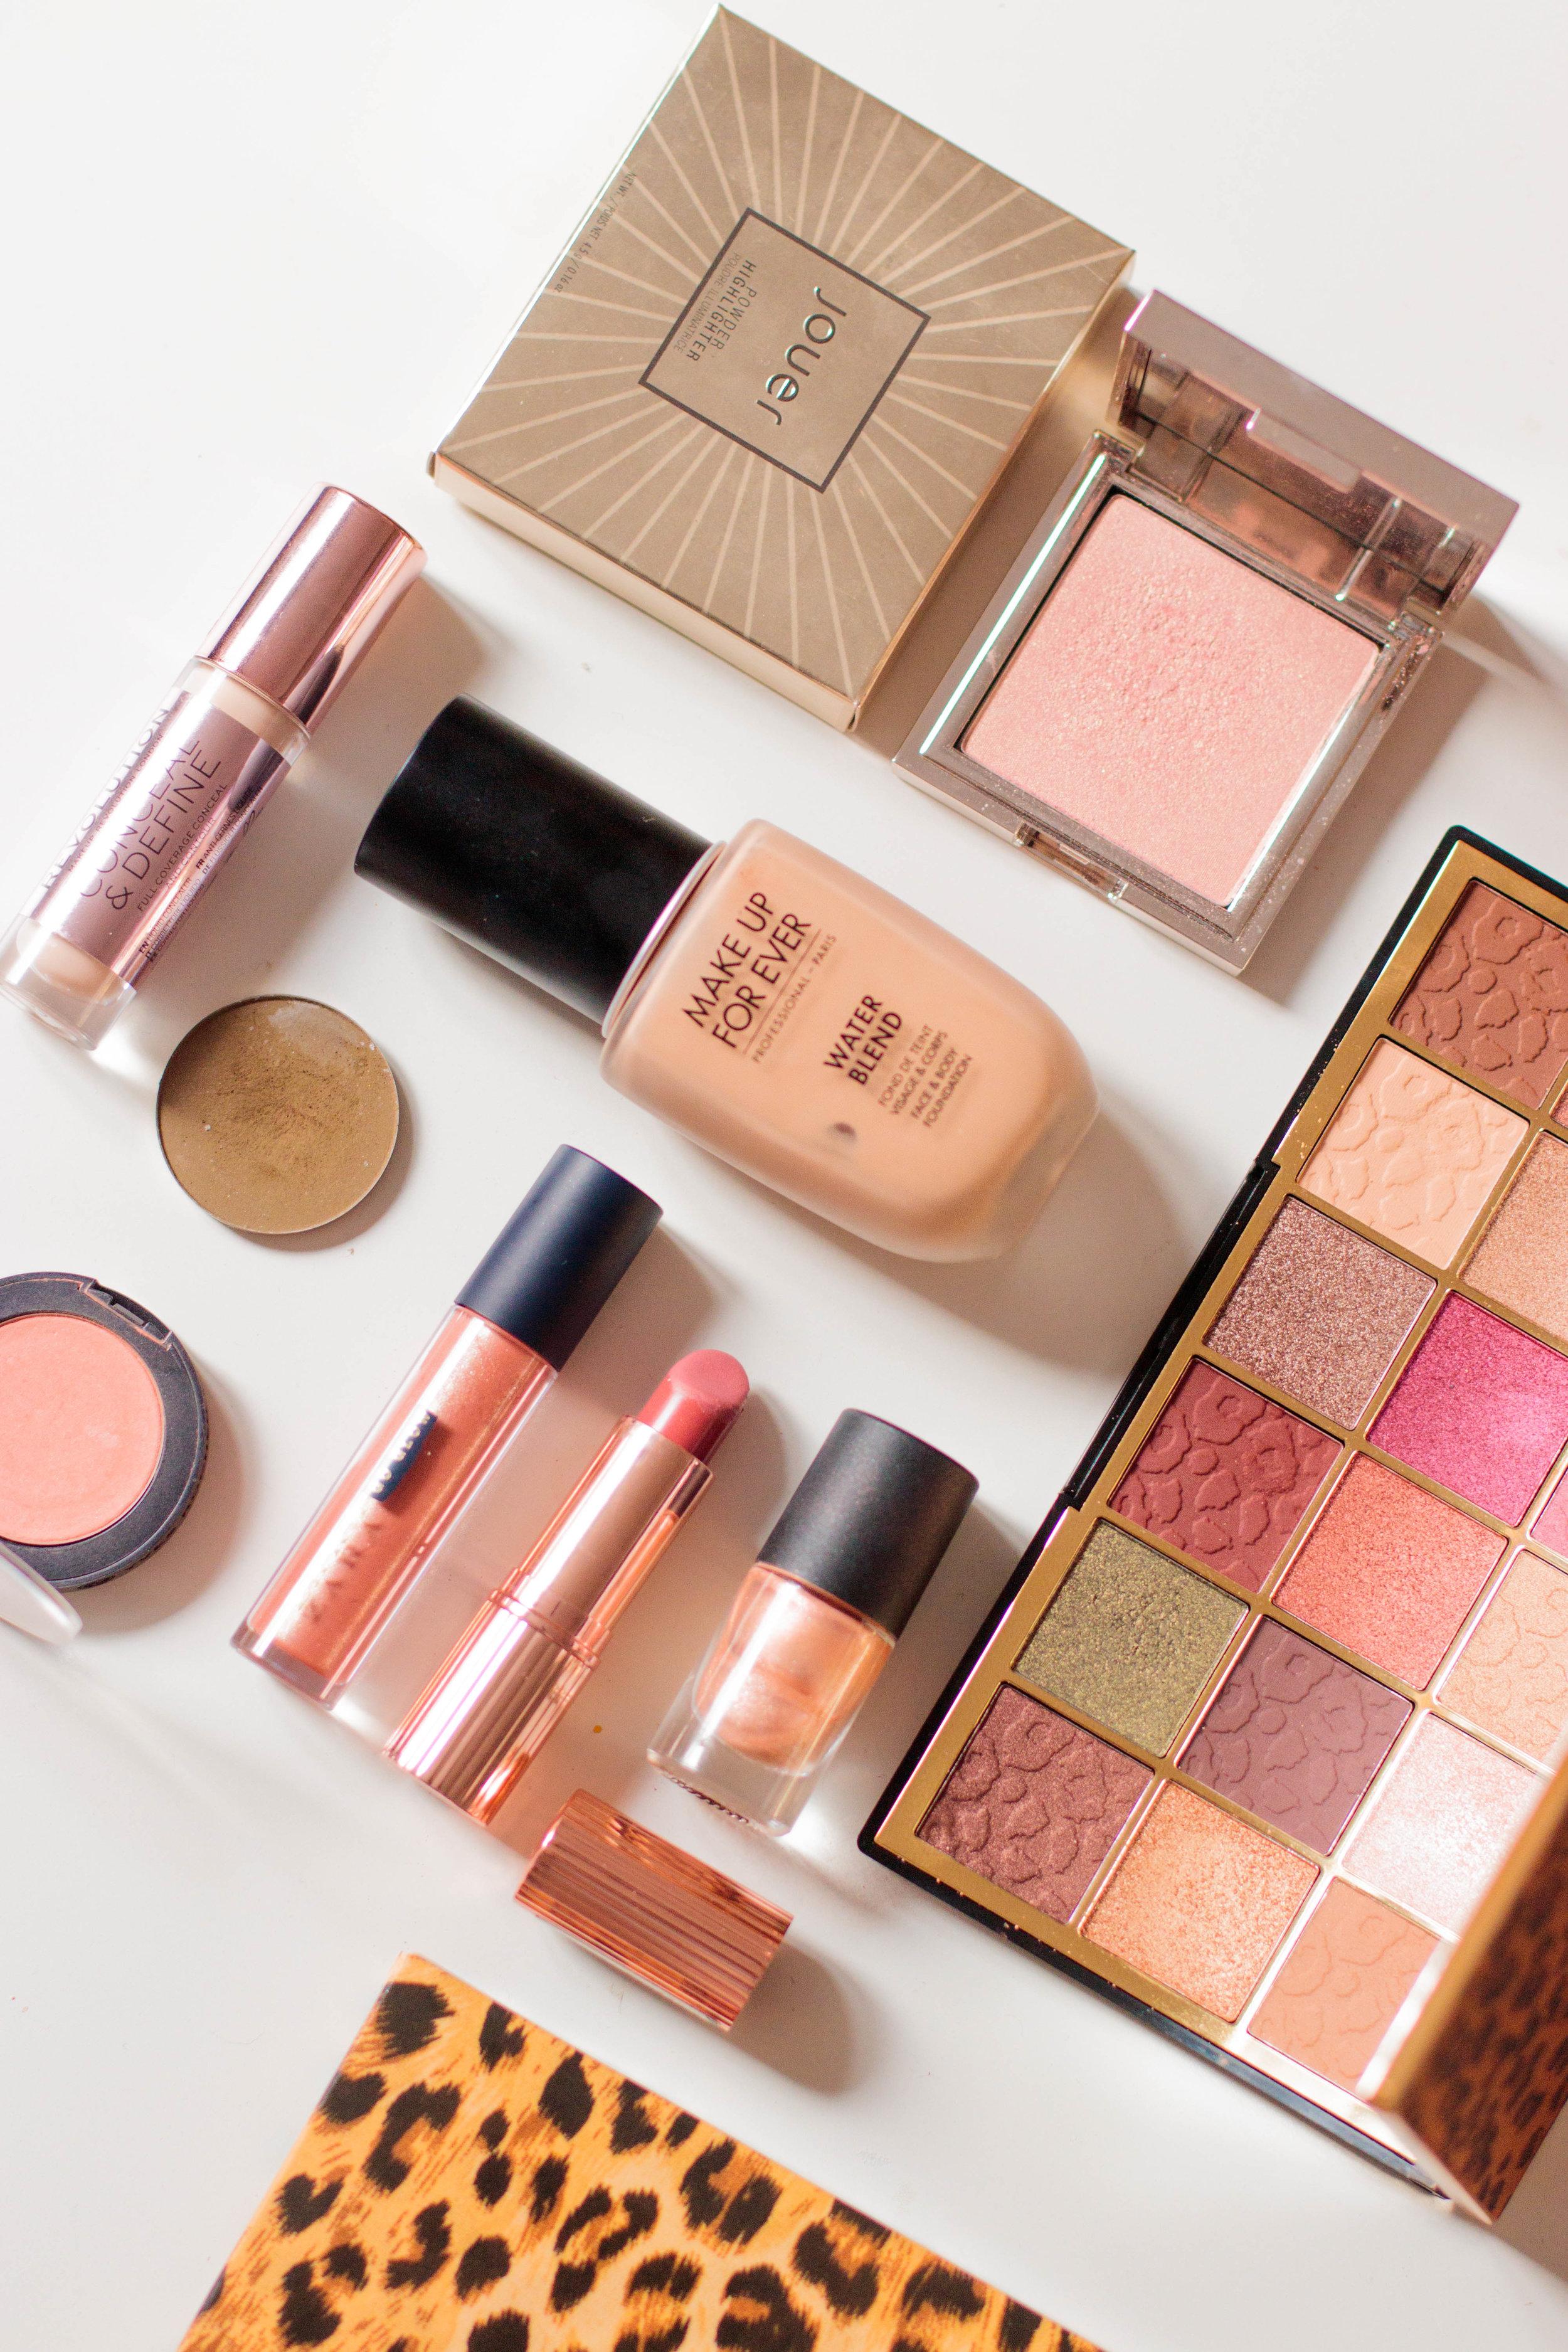 makeup-pauuulette-makeup-revolution-make-up-for-ever-jouer-cosmetics-yves-rocher.jpg